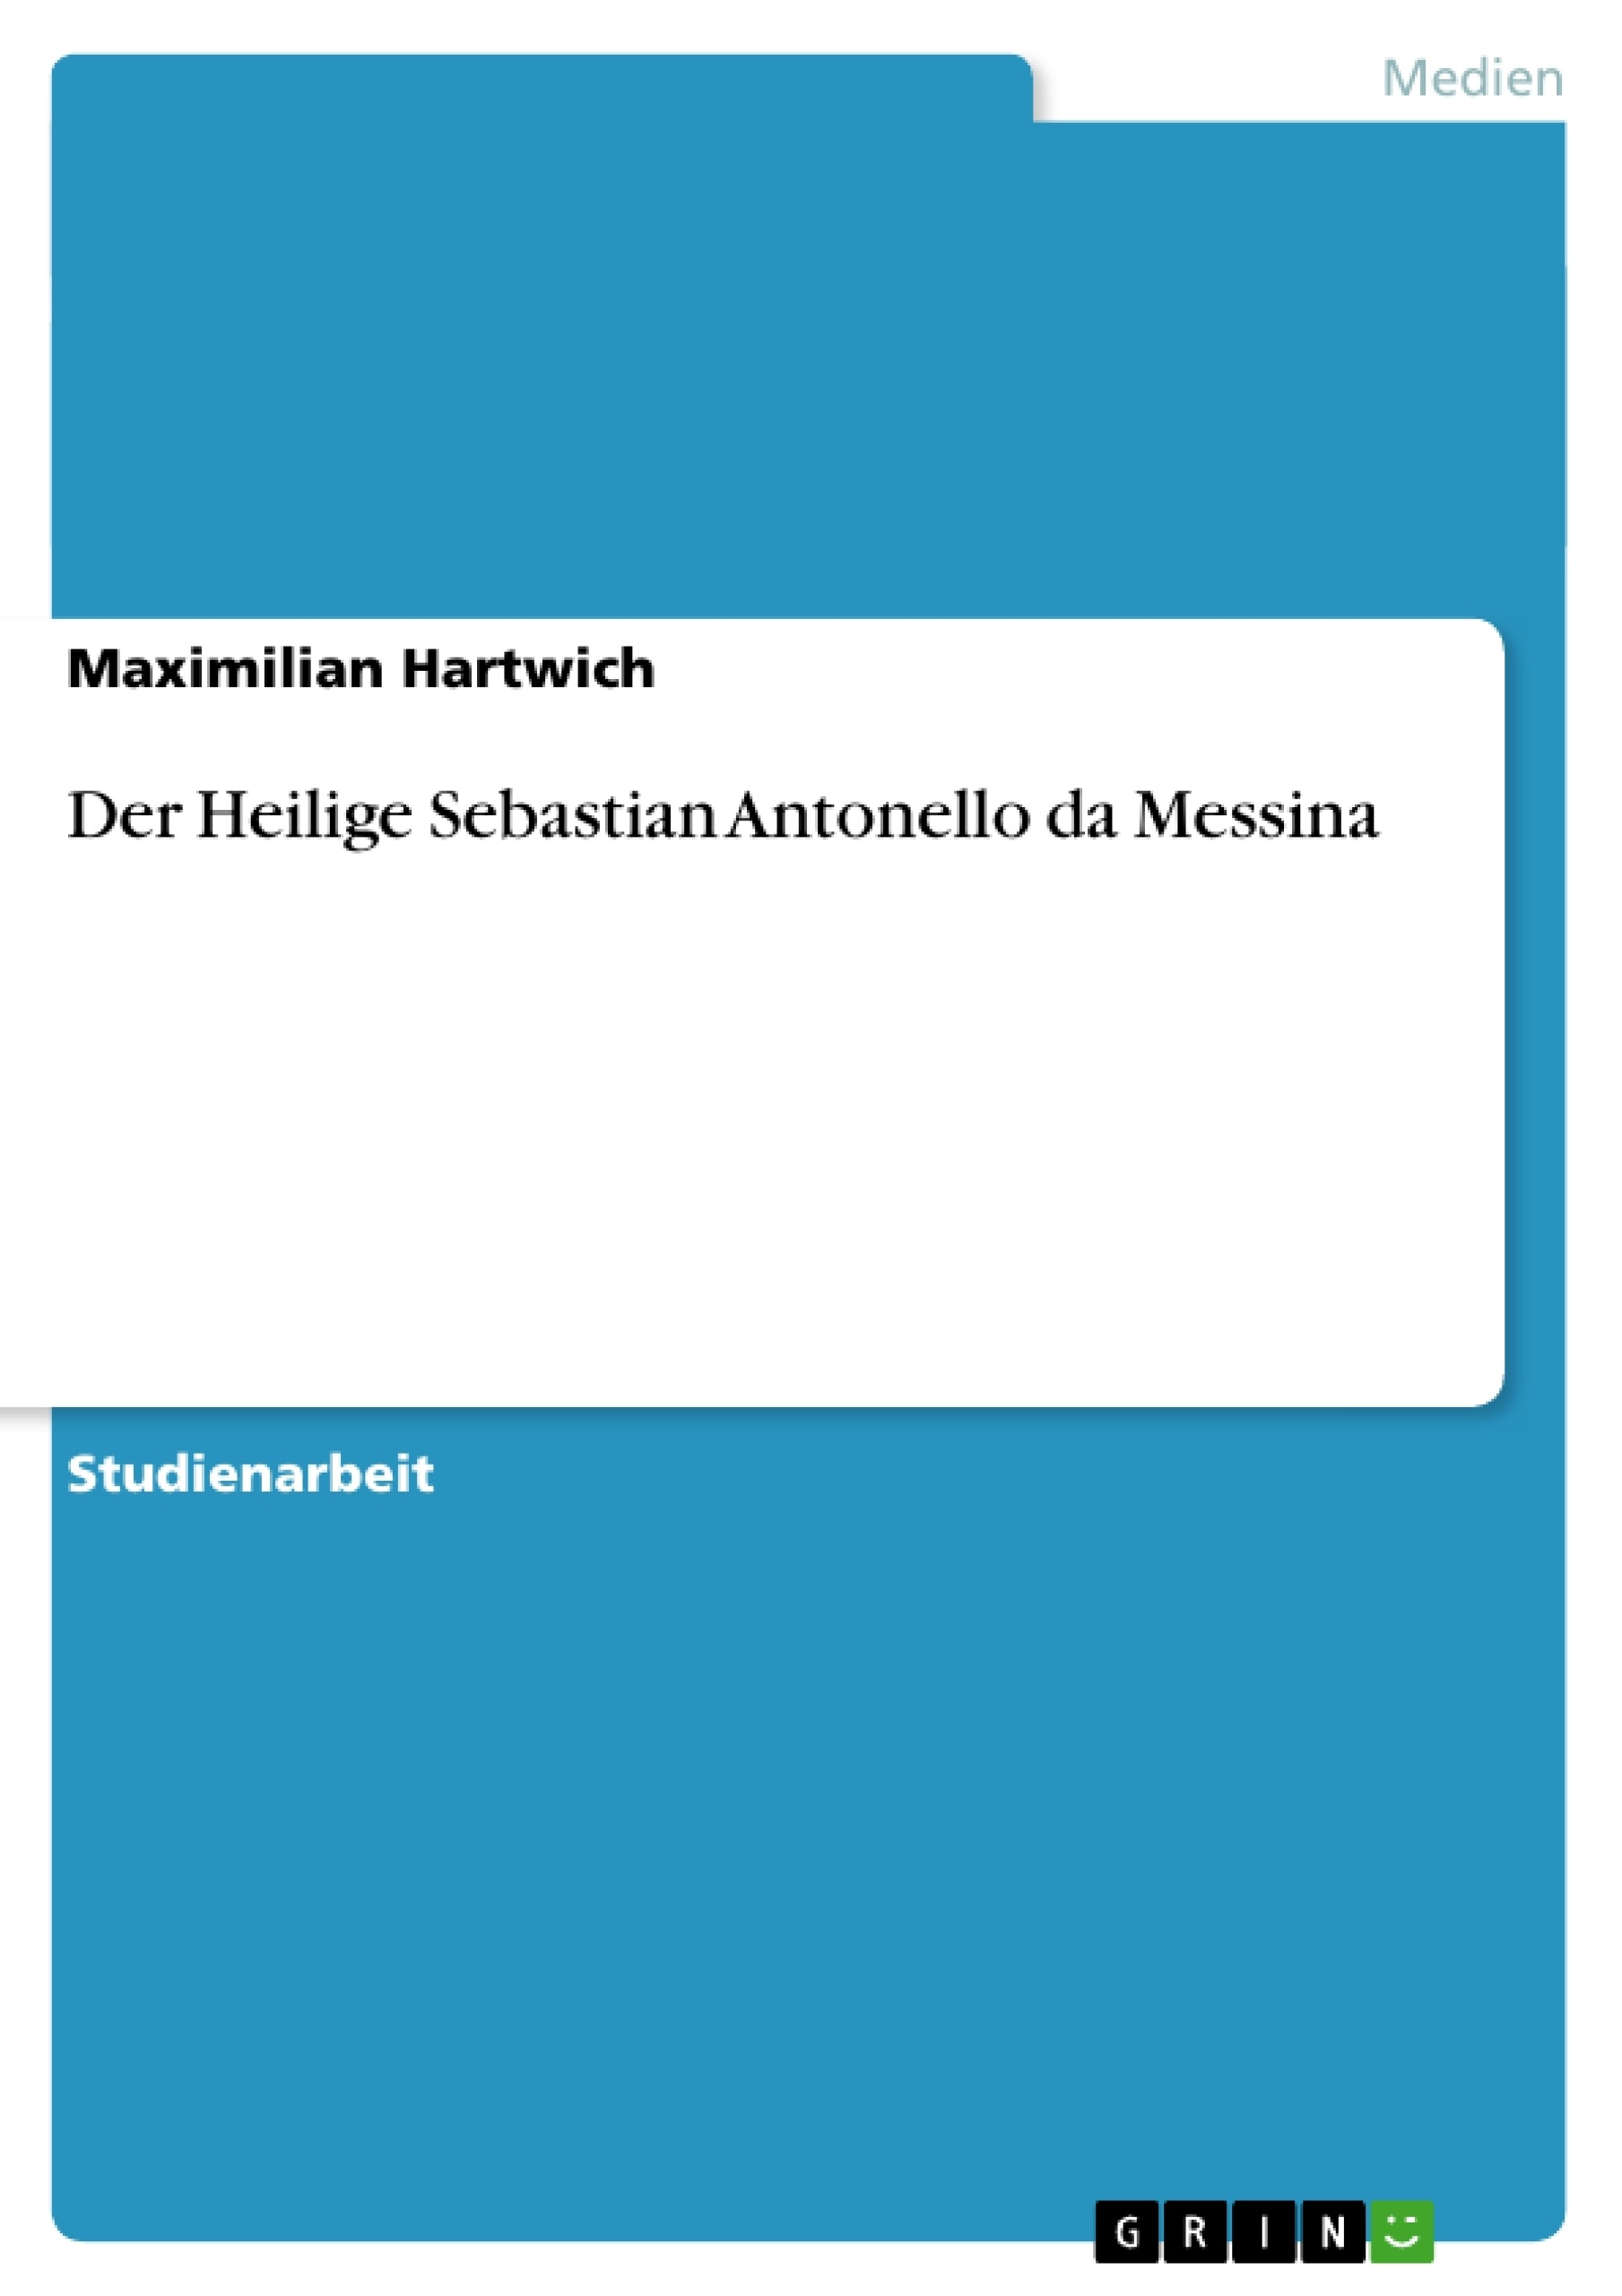 Titel: Der Heilige Sebastian Antonello da Messina